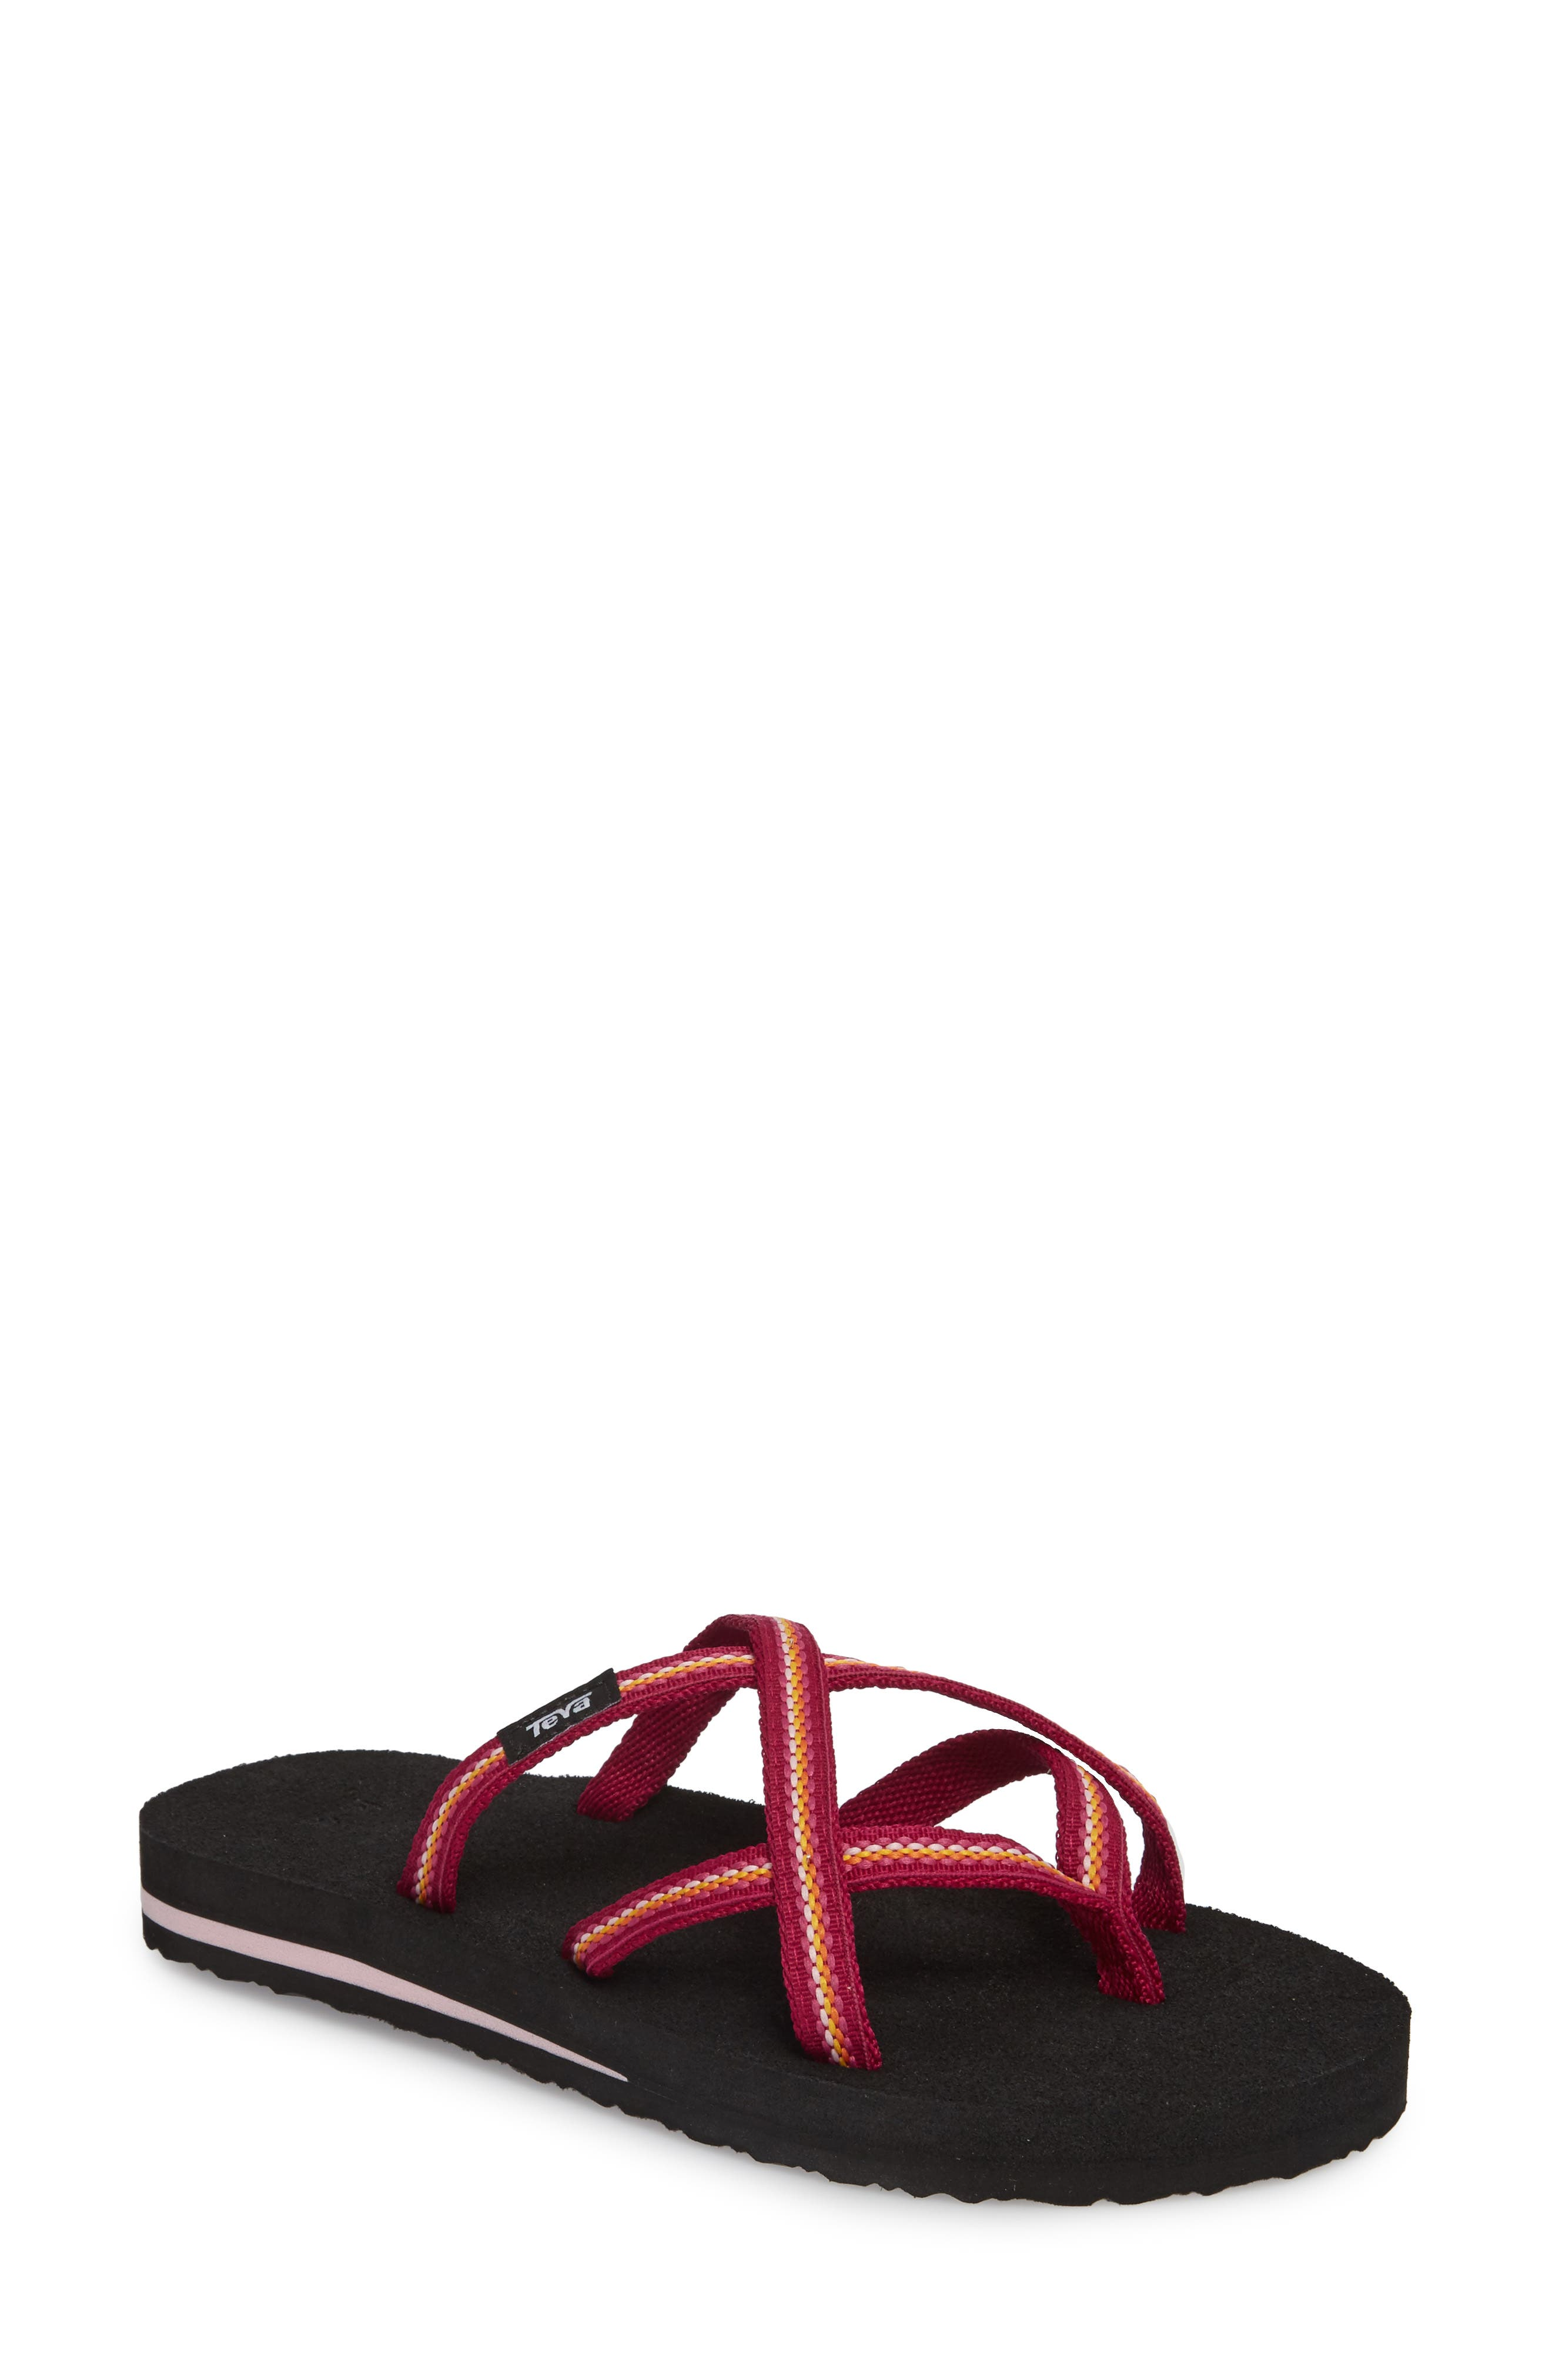 'Olowahu' Sandal,                         Main,                         color, BOYSENBERRY FABRIC